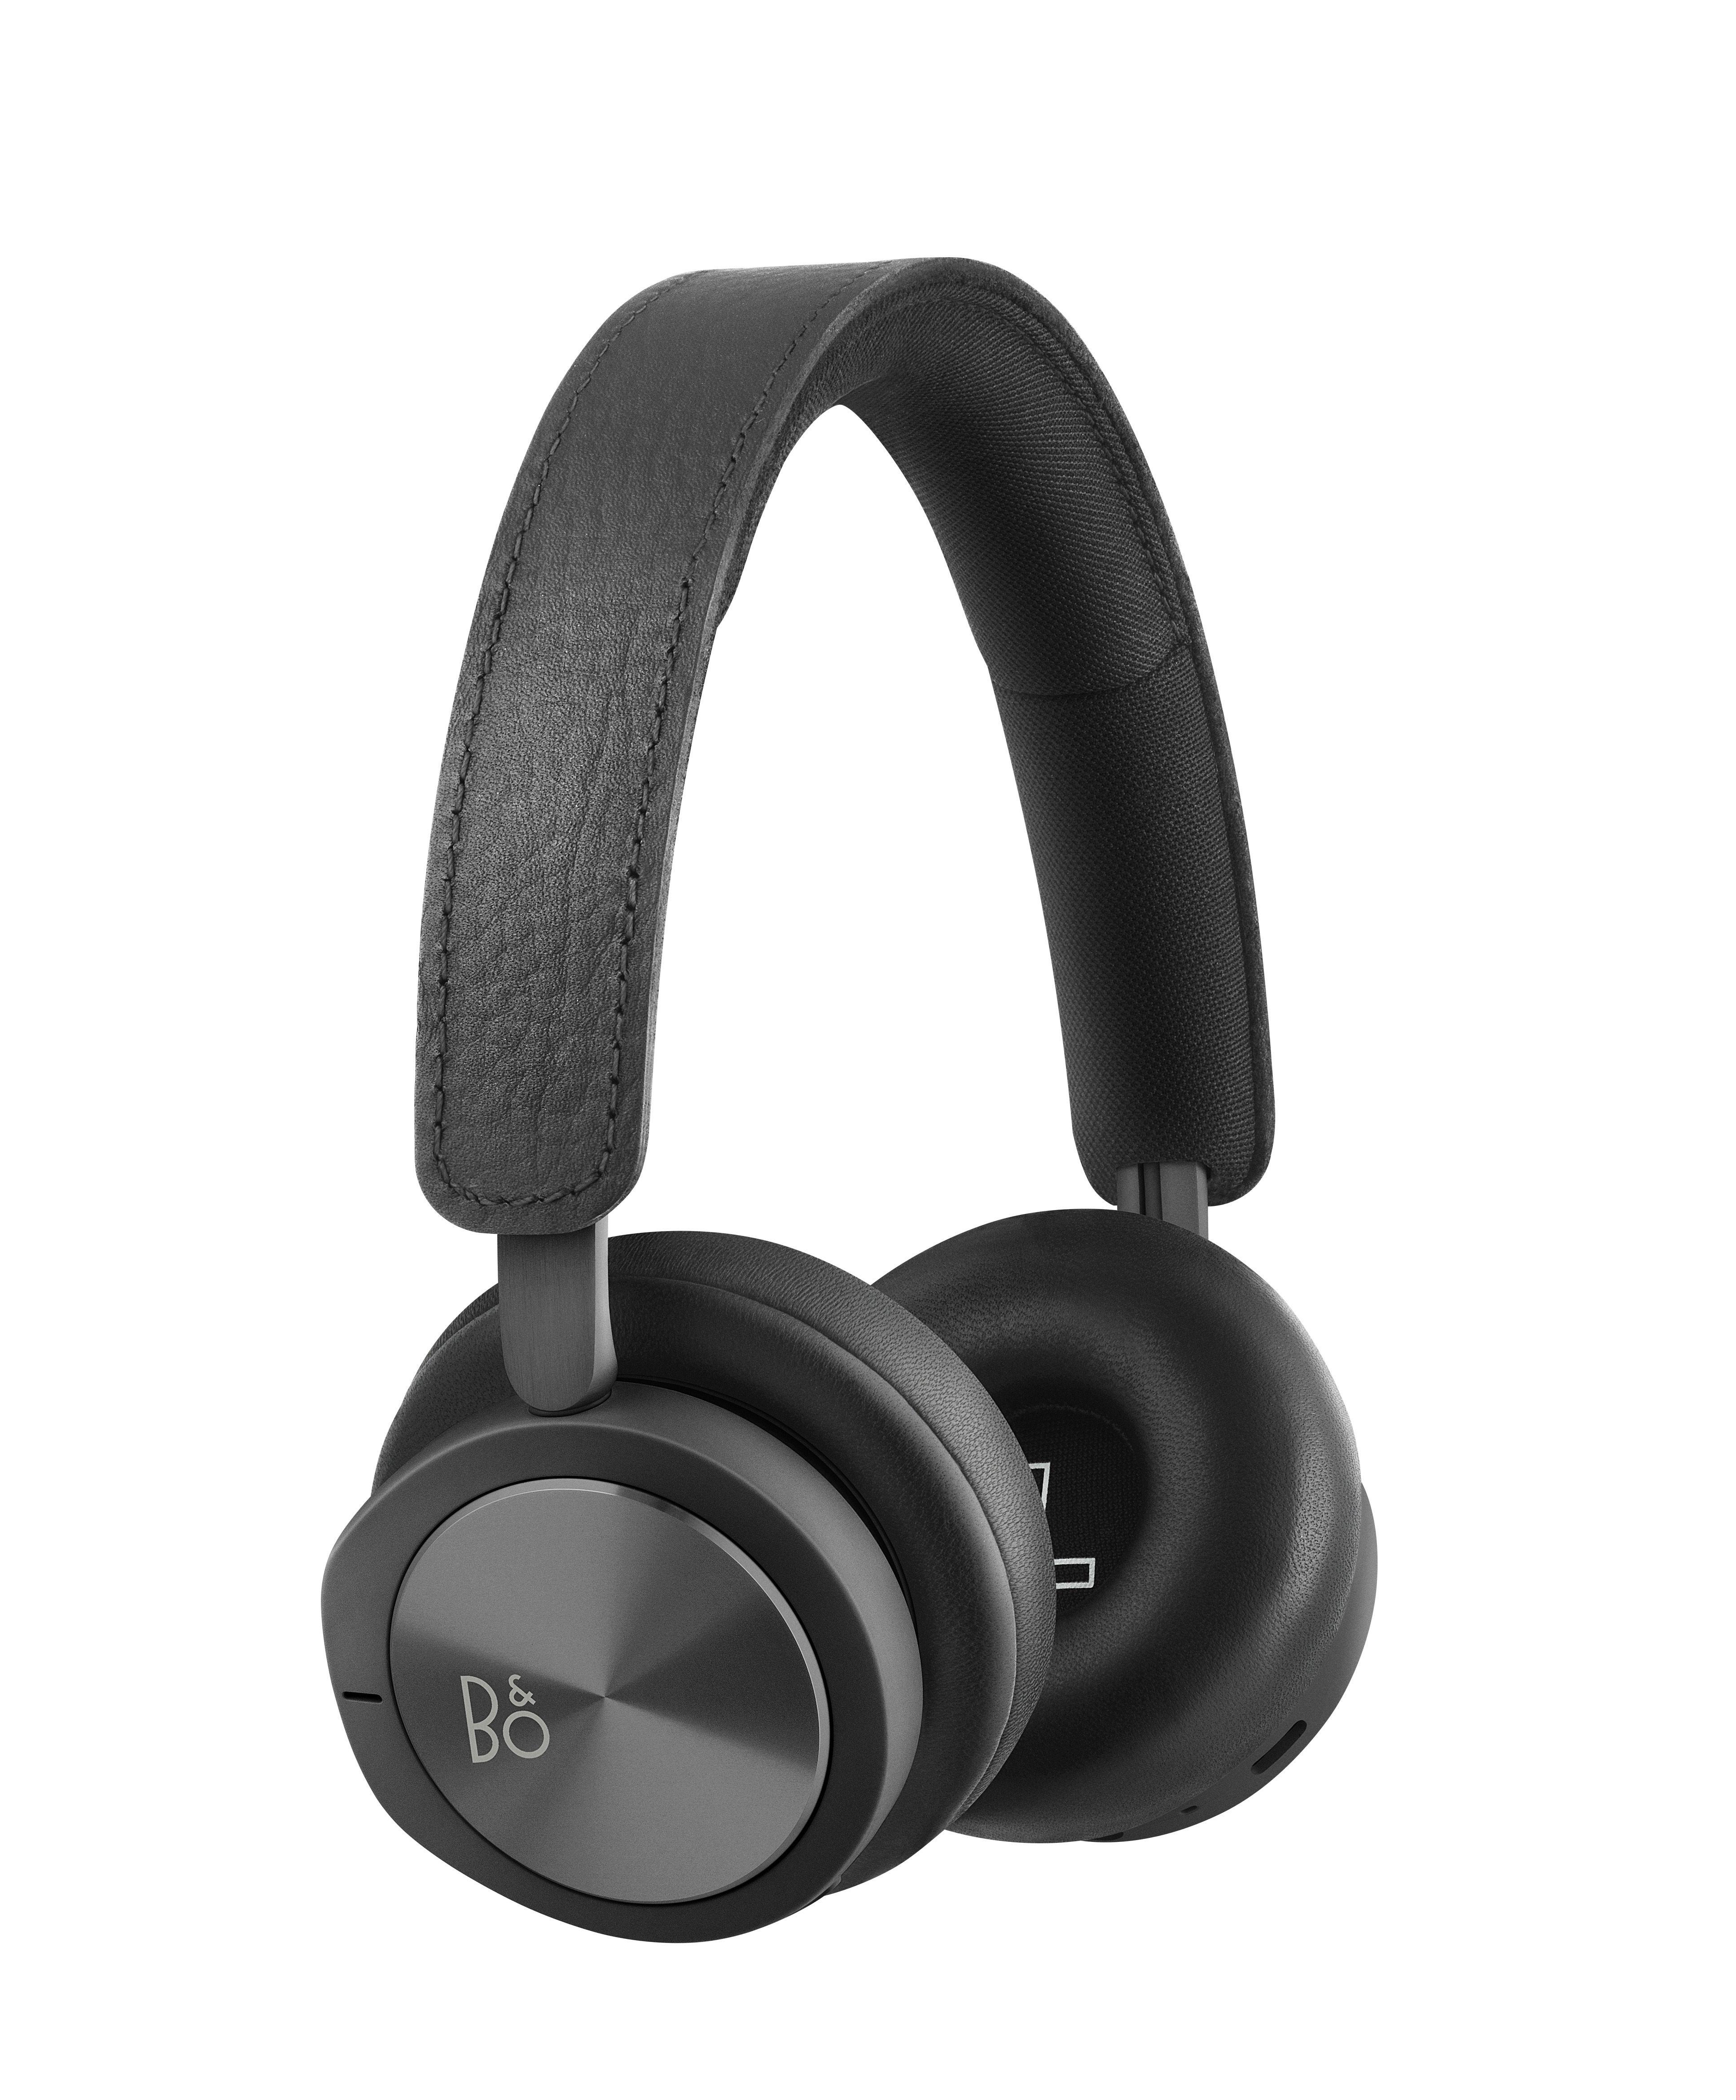 Accessoires - Lautsprecher & Ton - Beoplay H8i Kabellose Kopfhörer / Bluetooth - mit aktiver Geräuschunterdrückung - B&O PLAY by Bang & Olufsen - Schwarz - eloxiertes Aluminium, Leder